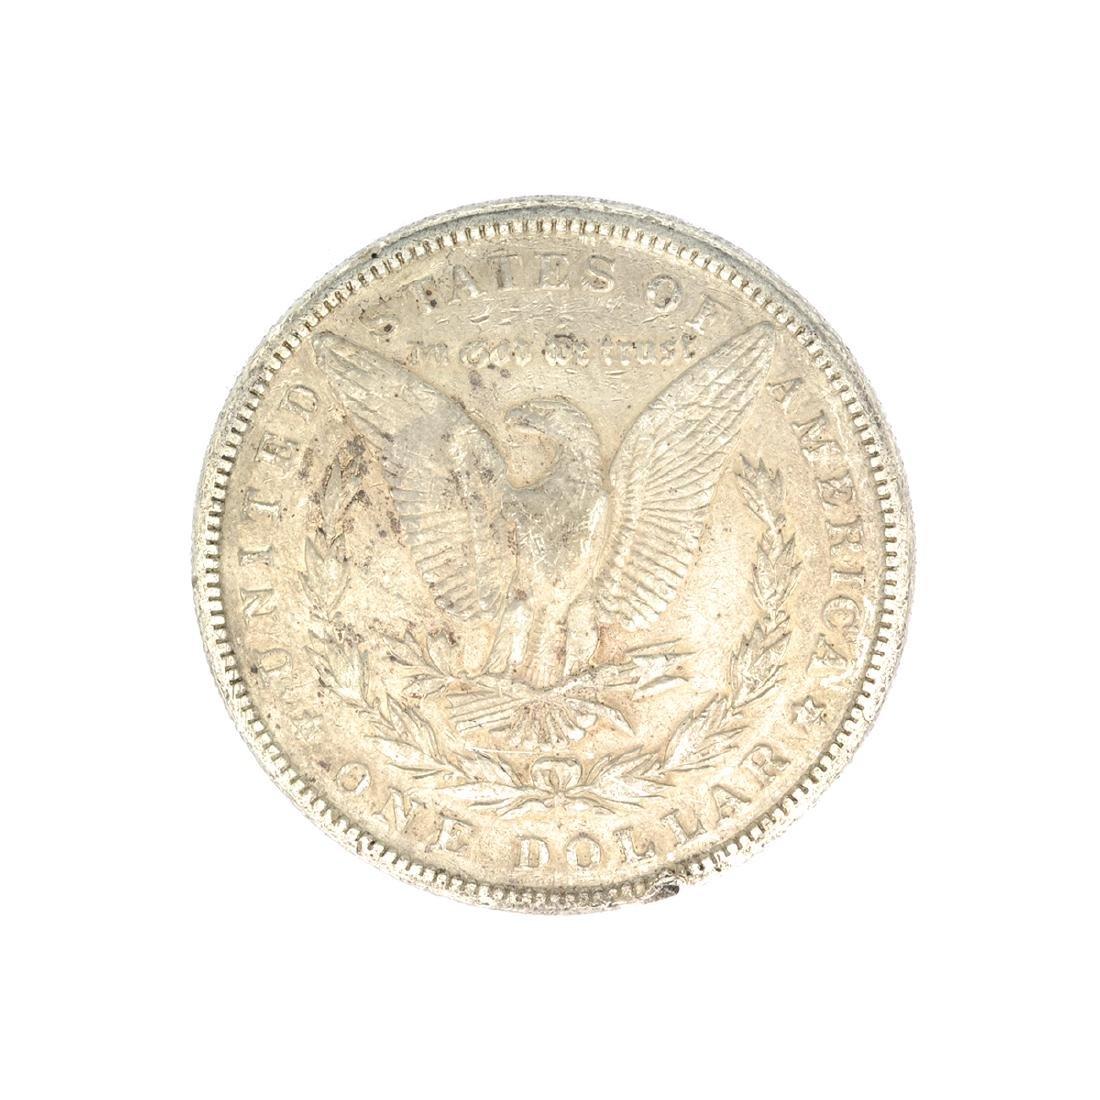 Rare 1881 U.S. Morgan Silver Dollar - 2